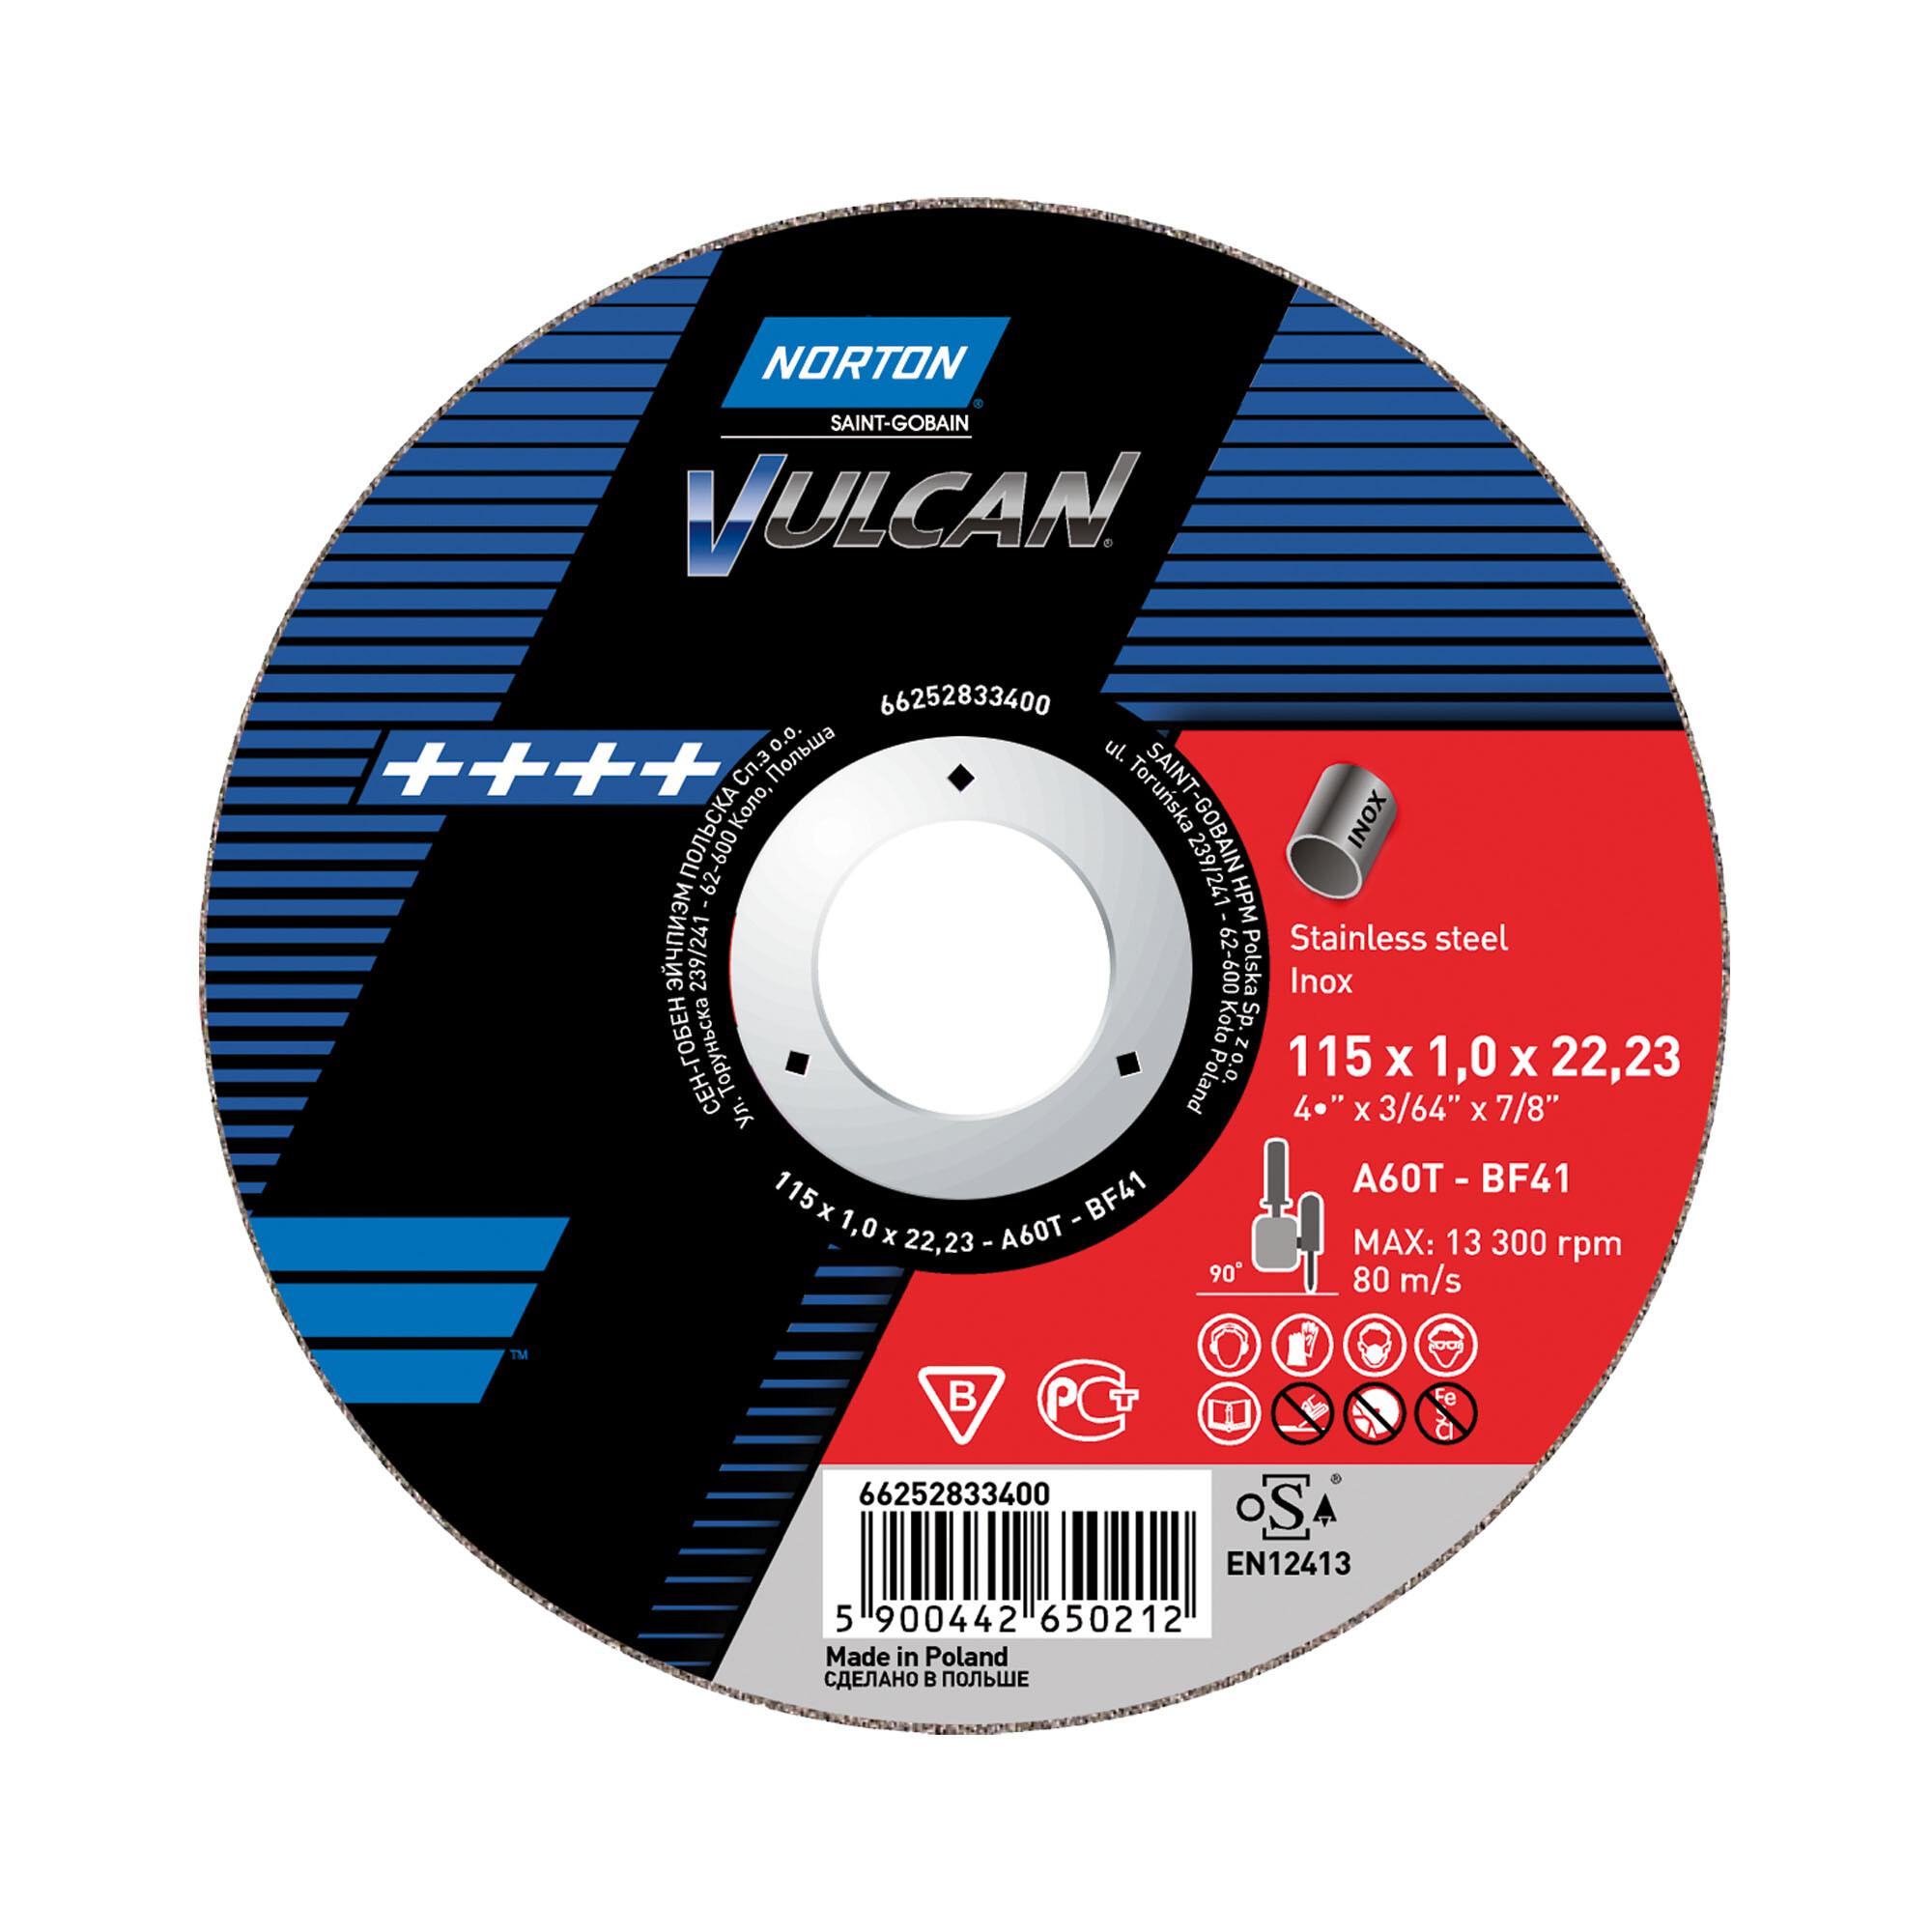 10 x NORTON Schruppscheibe gekröpft | 115x6,4x22,23 A 30 S Inox Vulcan Inox | 66252925513